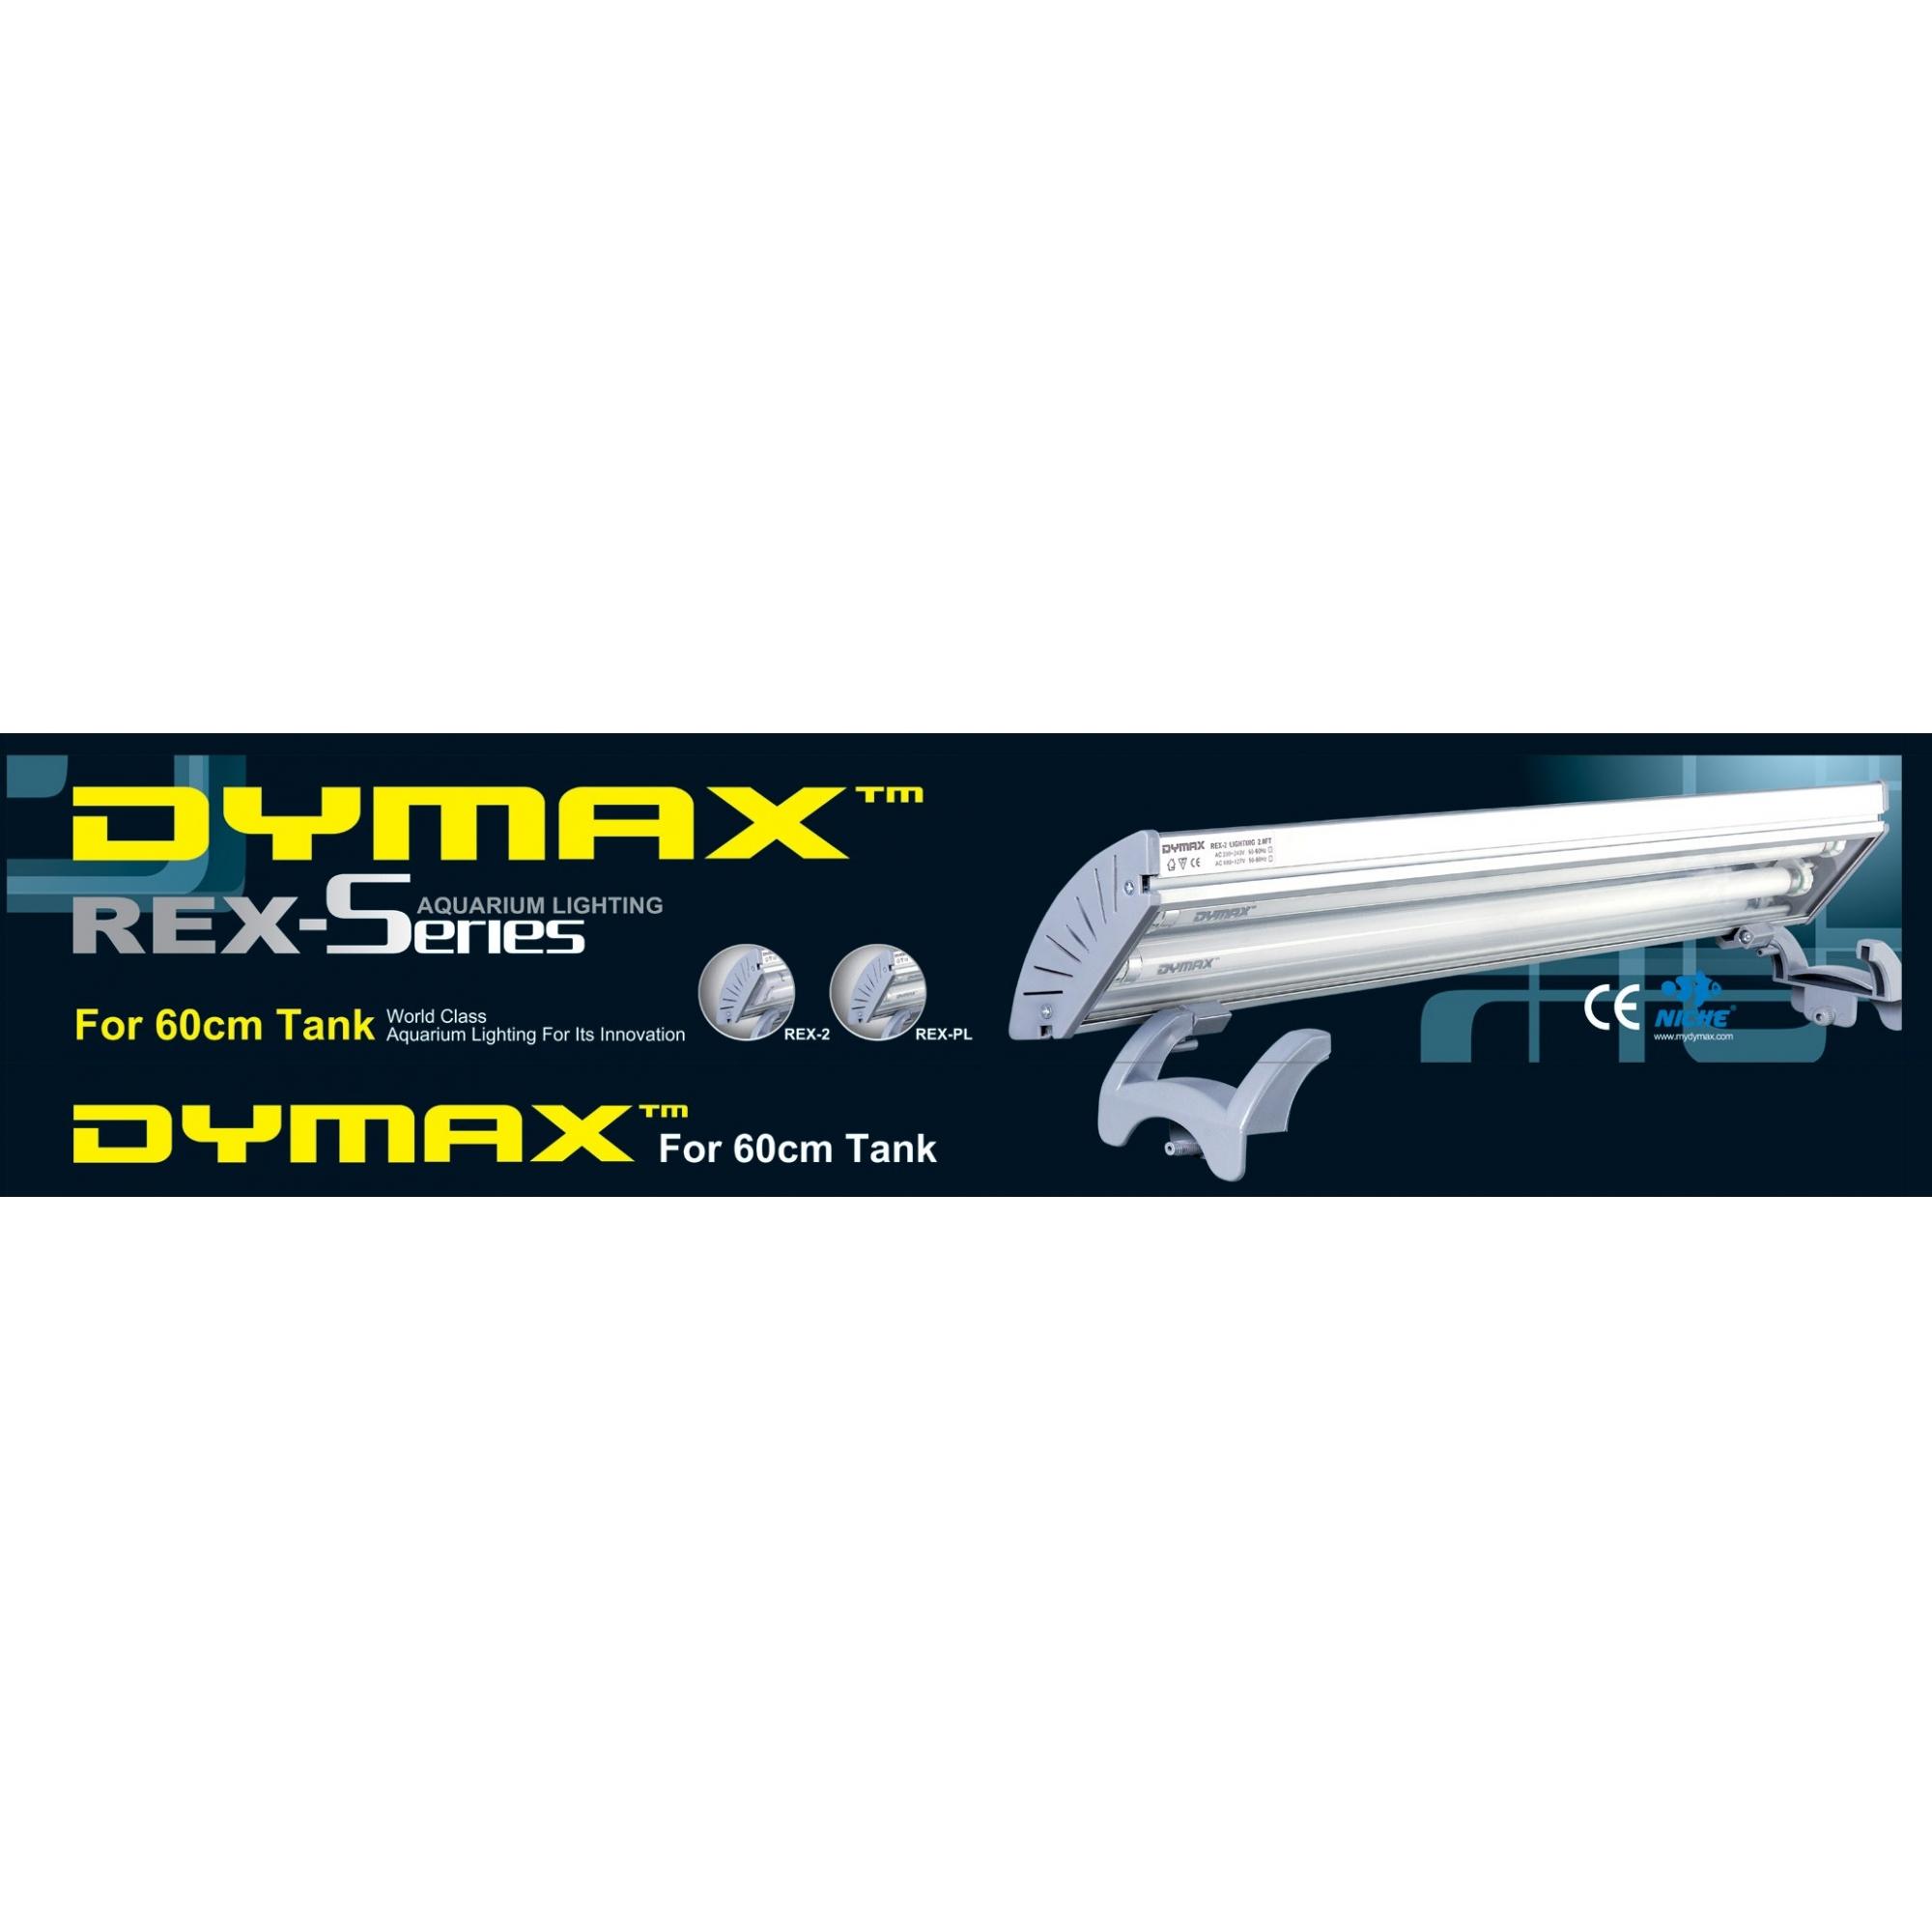 Dymax Luminária Pl Rex-Pld (2X 55W) 60cm 110V